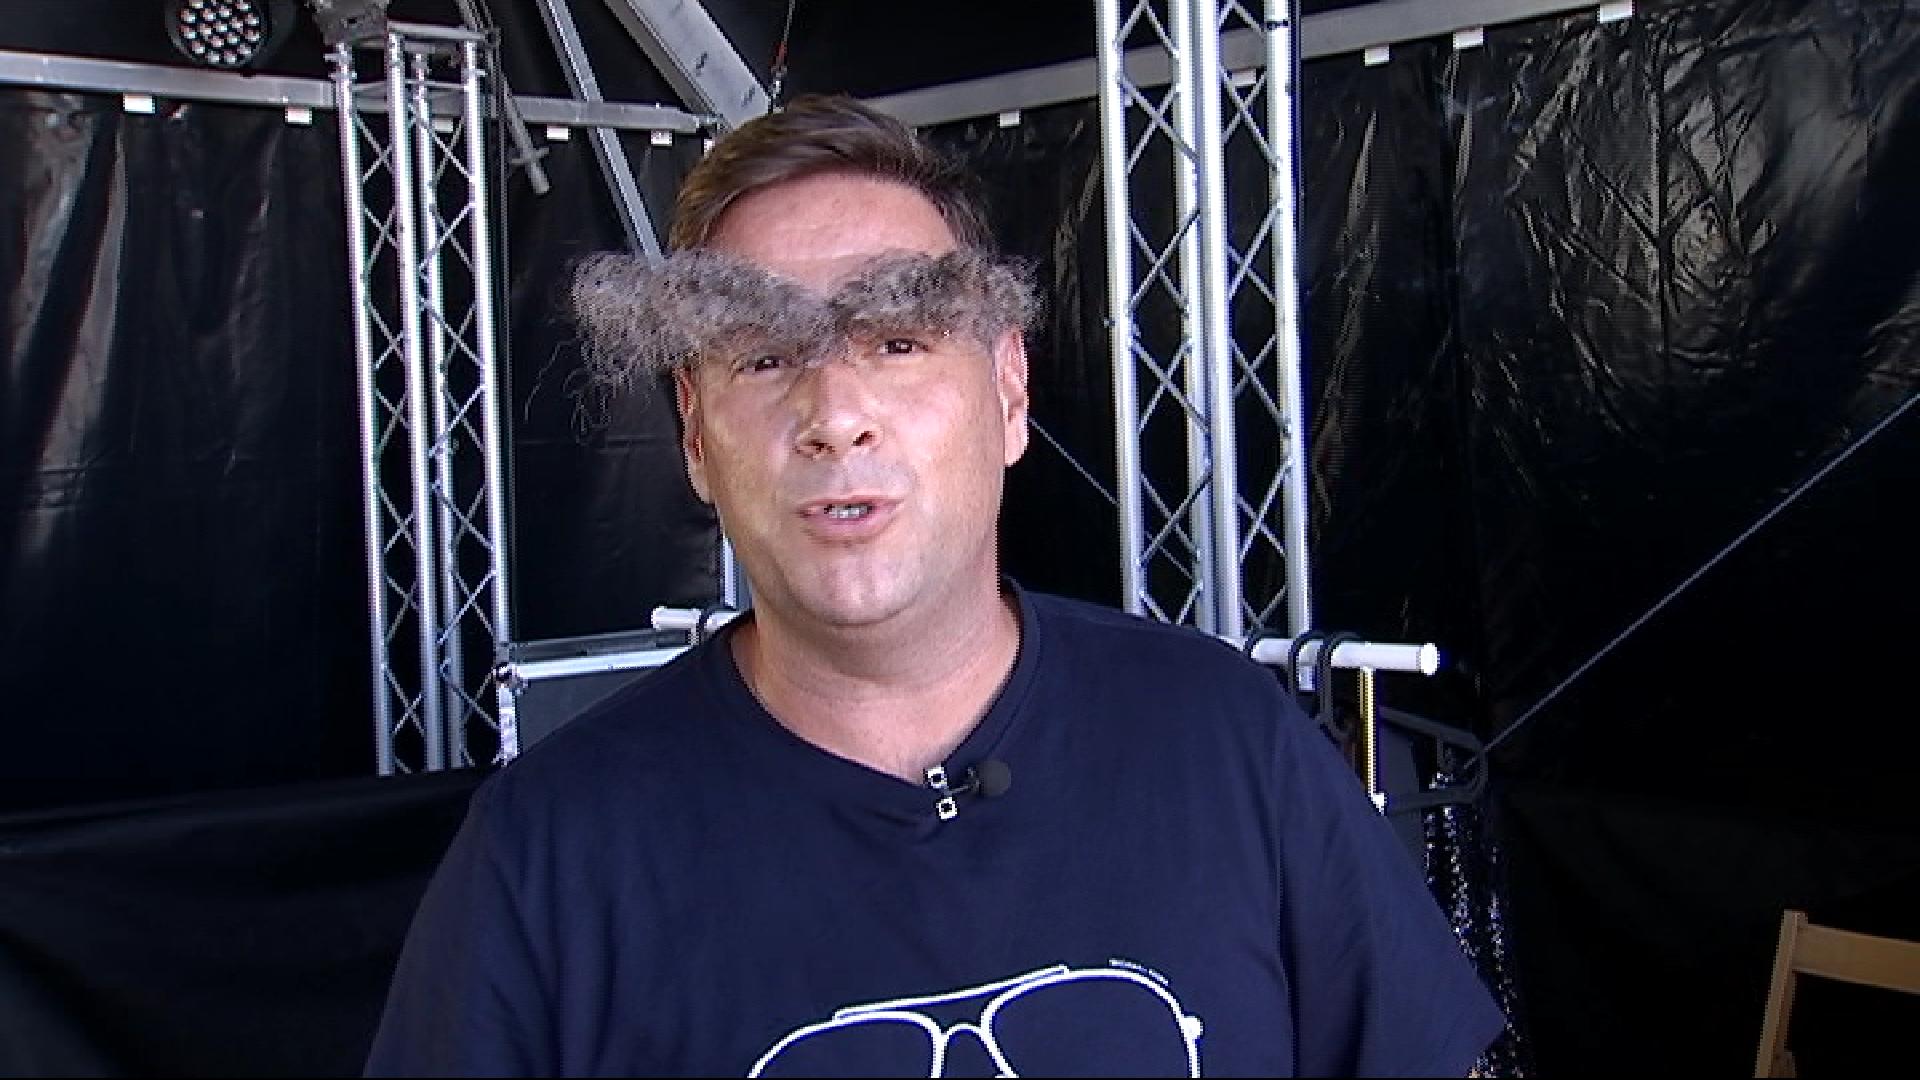 Carlos+Latre%2C+humor+i+actualitat+avui+a+Port+Adriano